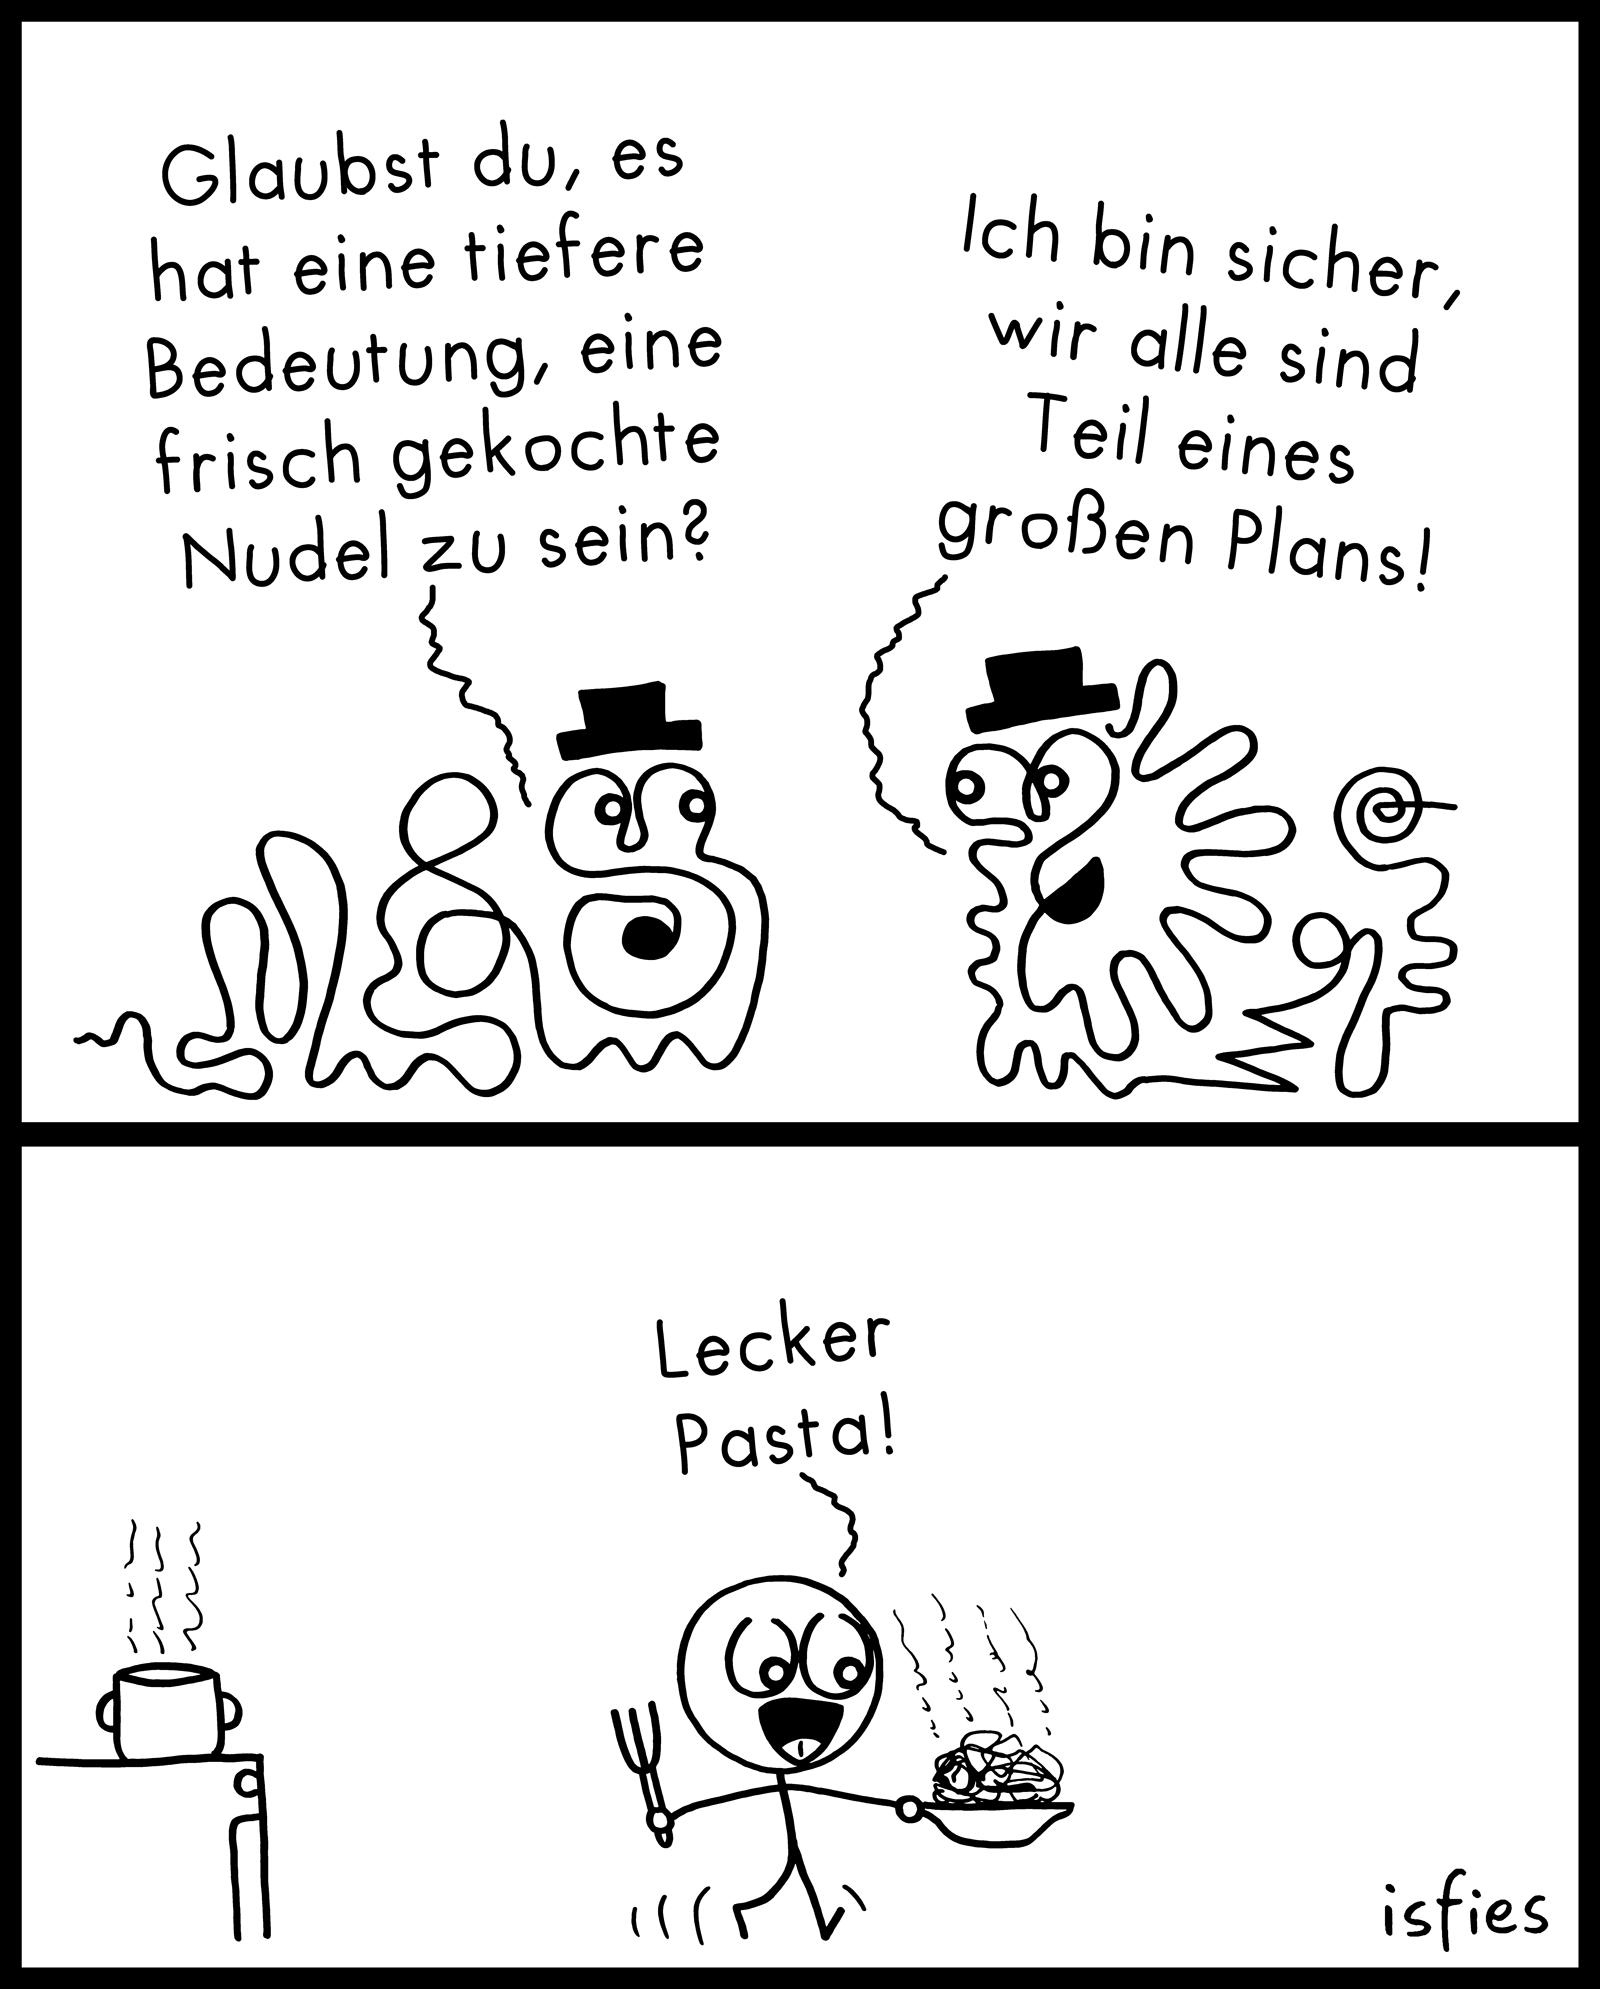 #nudeln #hilosophie #leben #essen #lecker #lustig #isfies ...